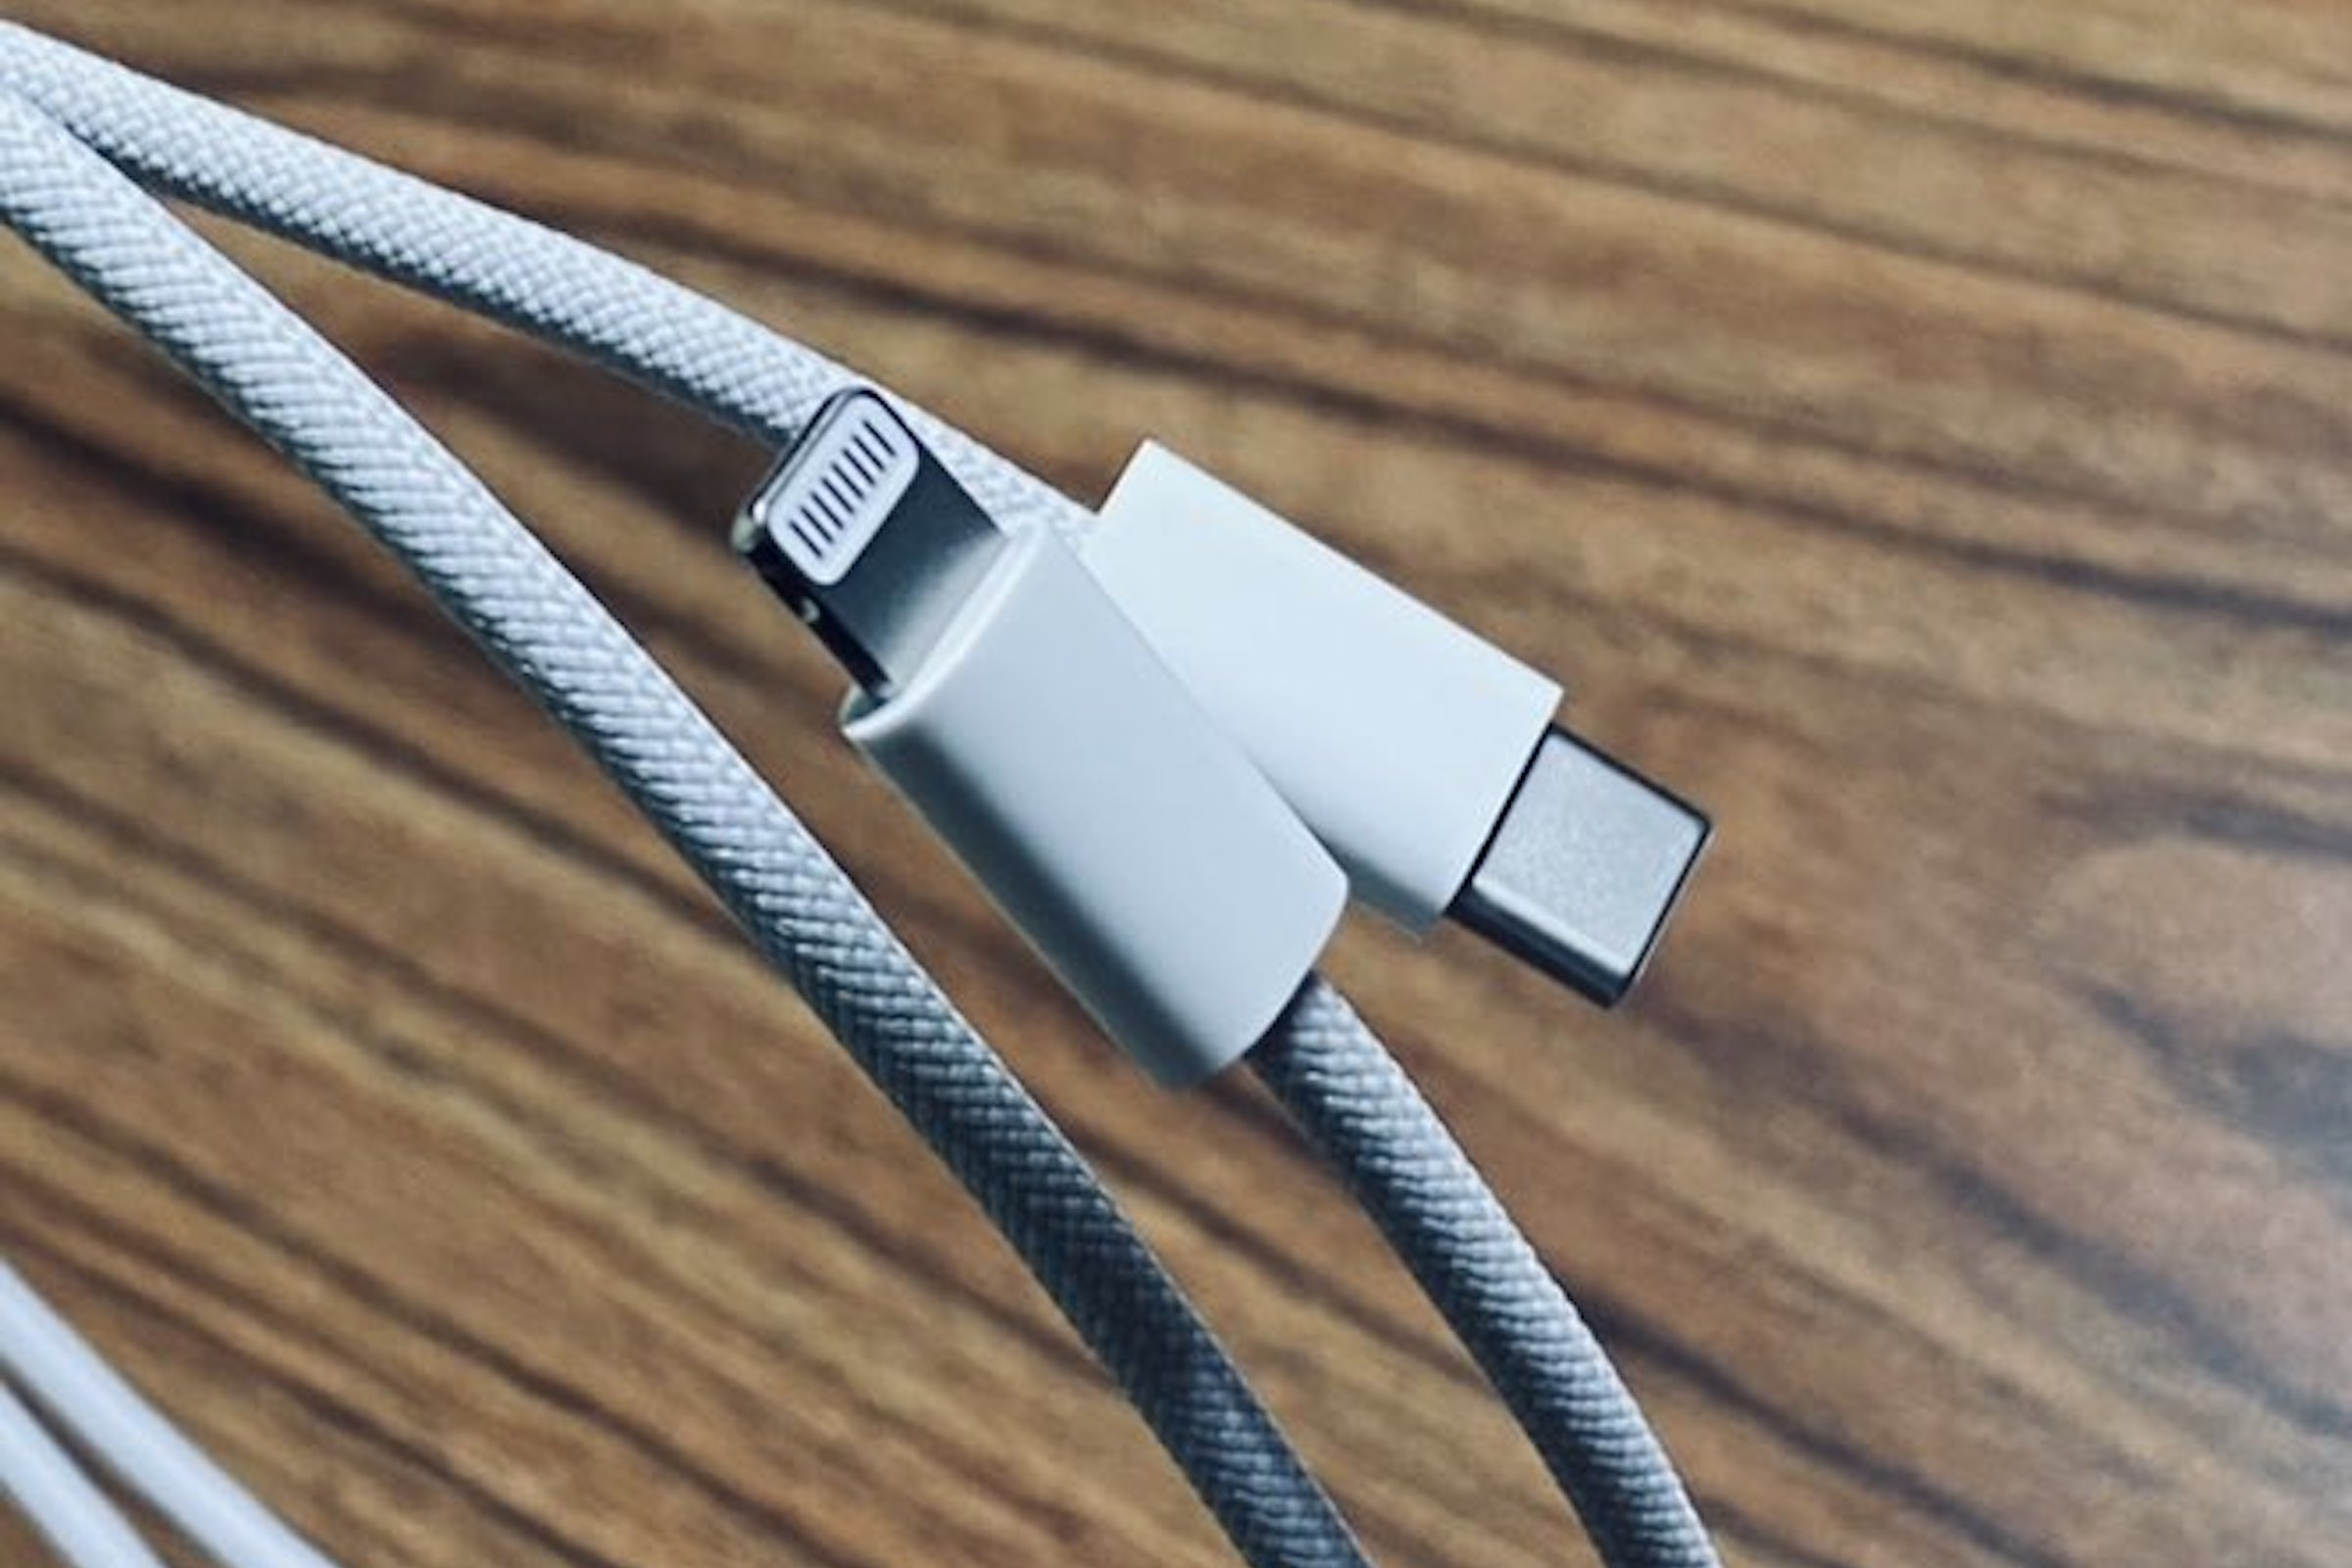 iphone-12-lightning-oplot-kabel-przewod 1